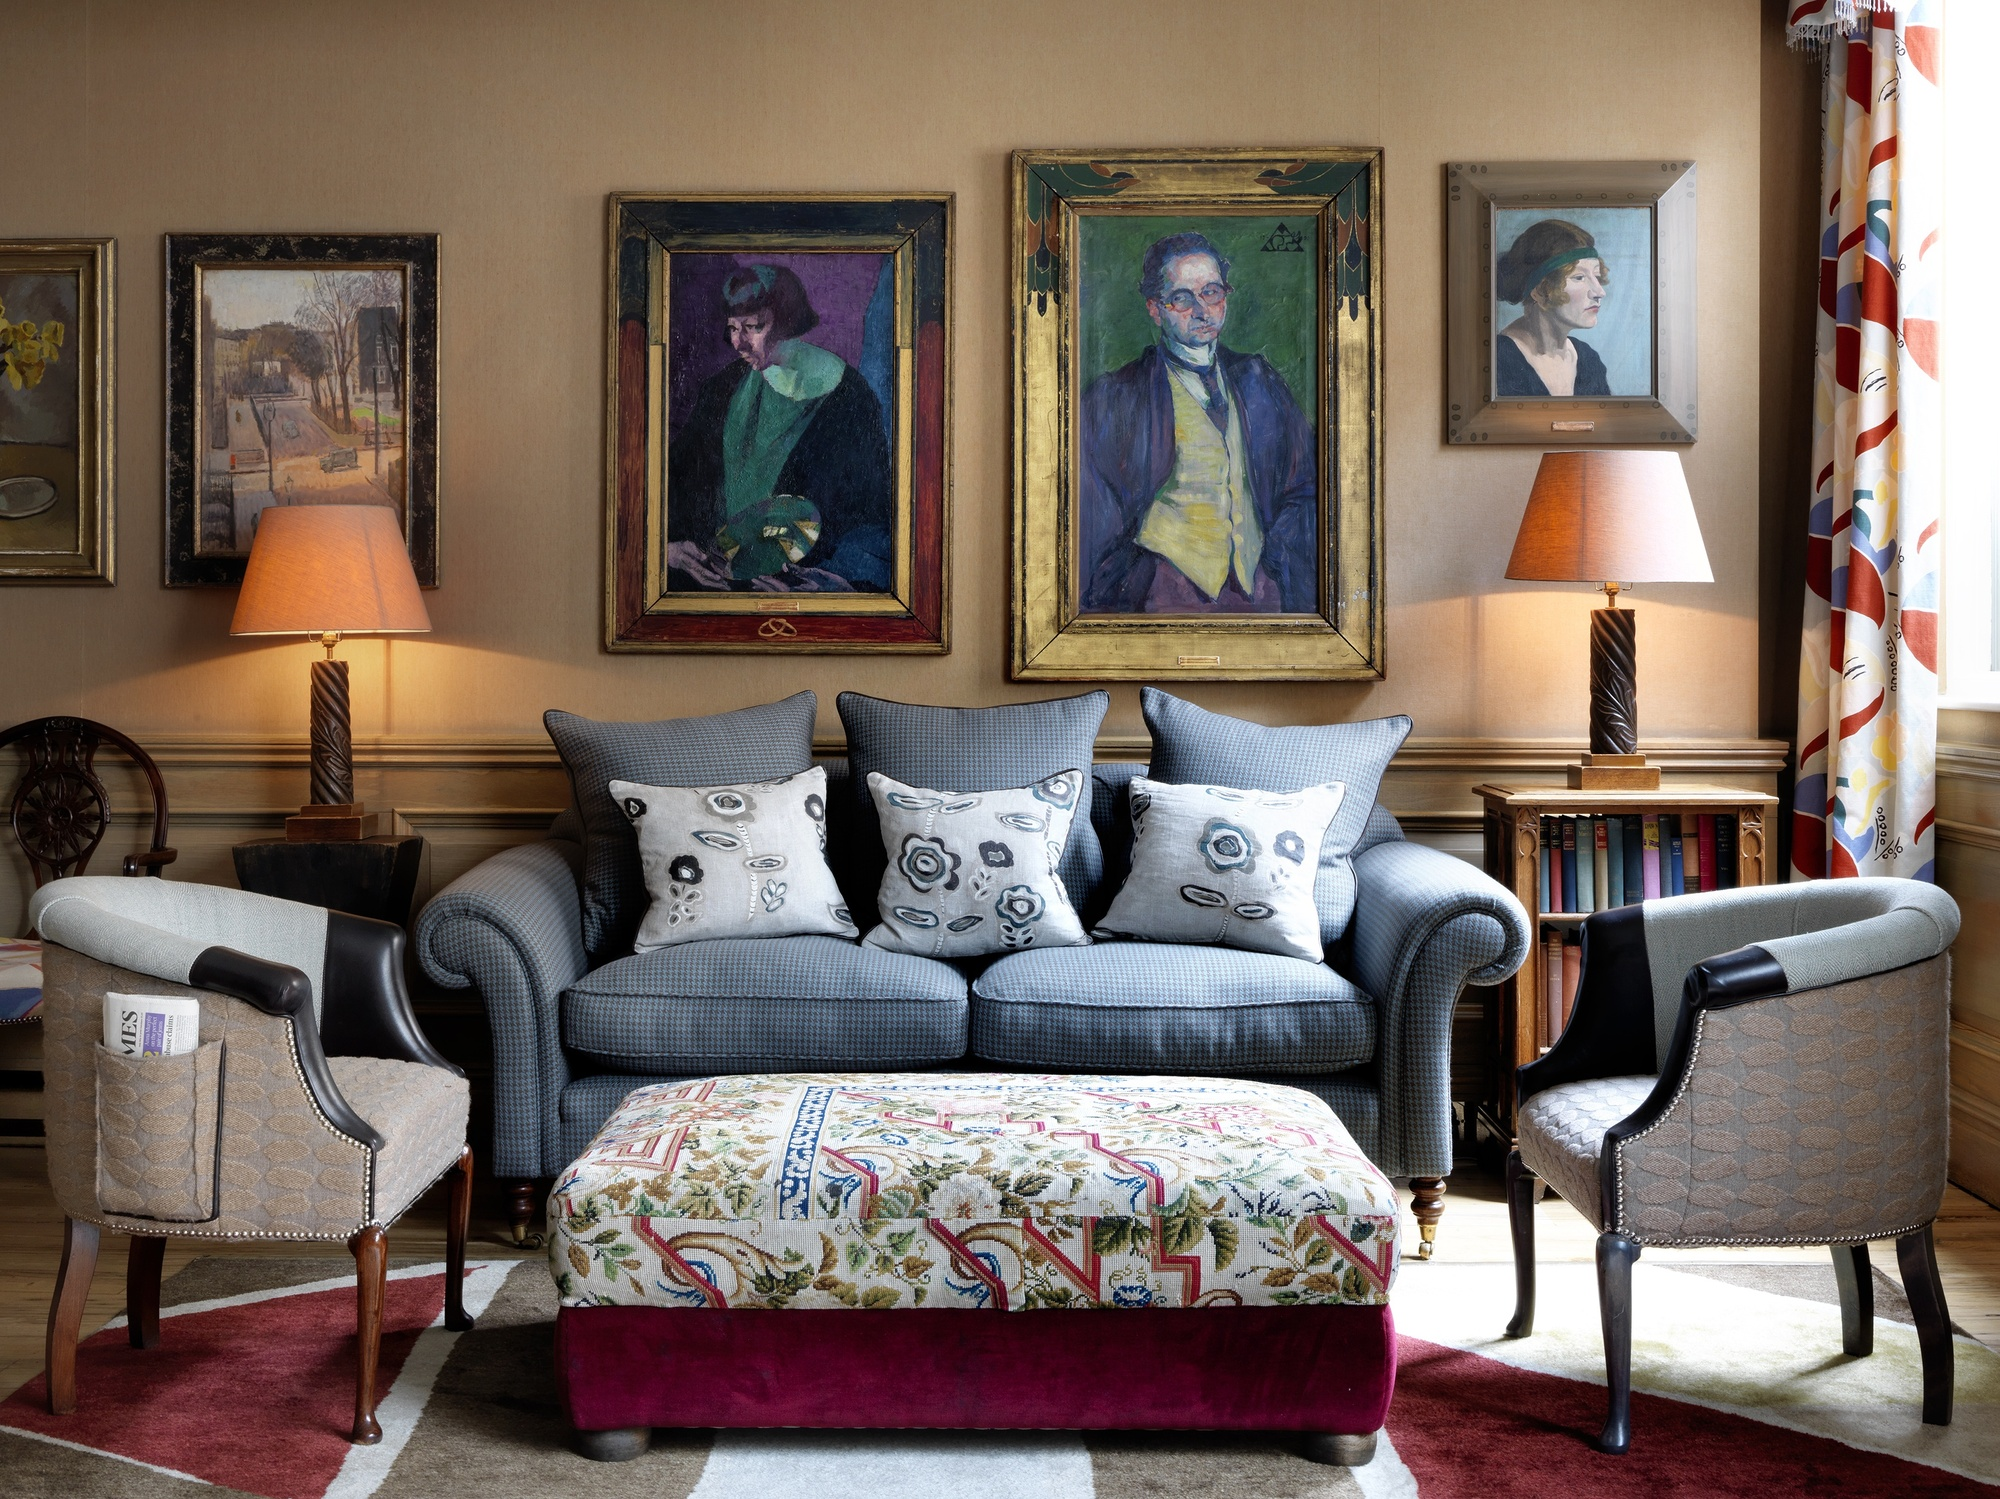 bloomsbury news drawing piano room designing kit charlotte design nobile interior in kemp street matthew travers conversation with